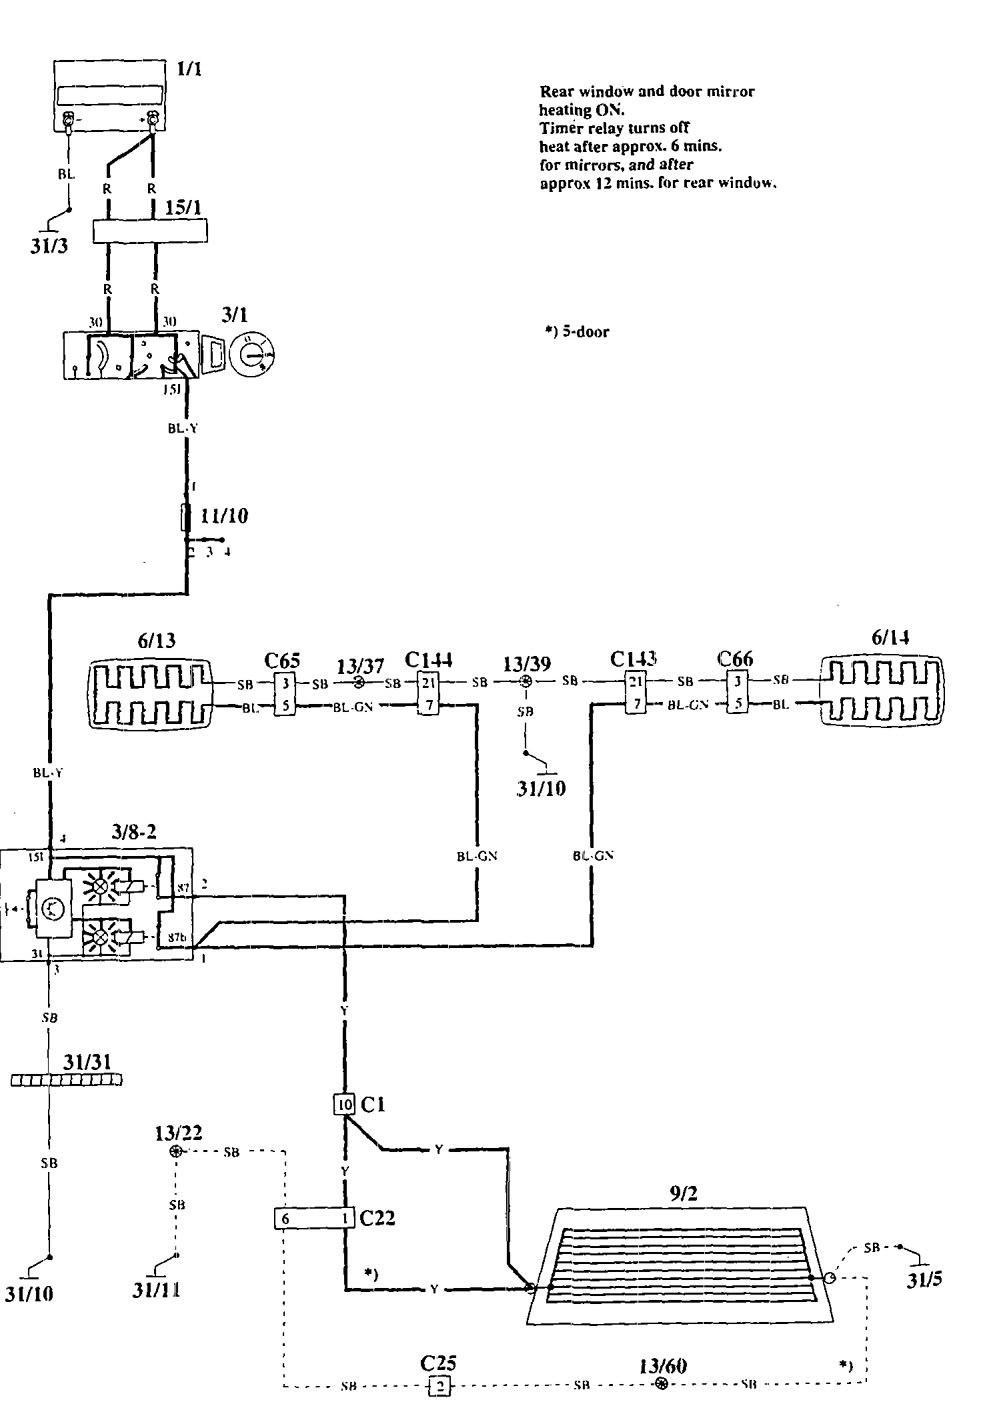 Volvo 940 Wiring Diagram 1995: Volvo 940 (1995) u2013 wiring diagrams u2013 rear window defogger u2013 CARKNOWLEDGErh:carknowledge.info,Design